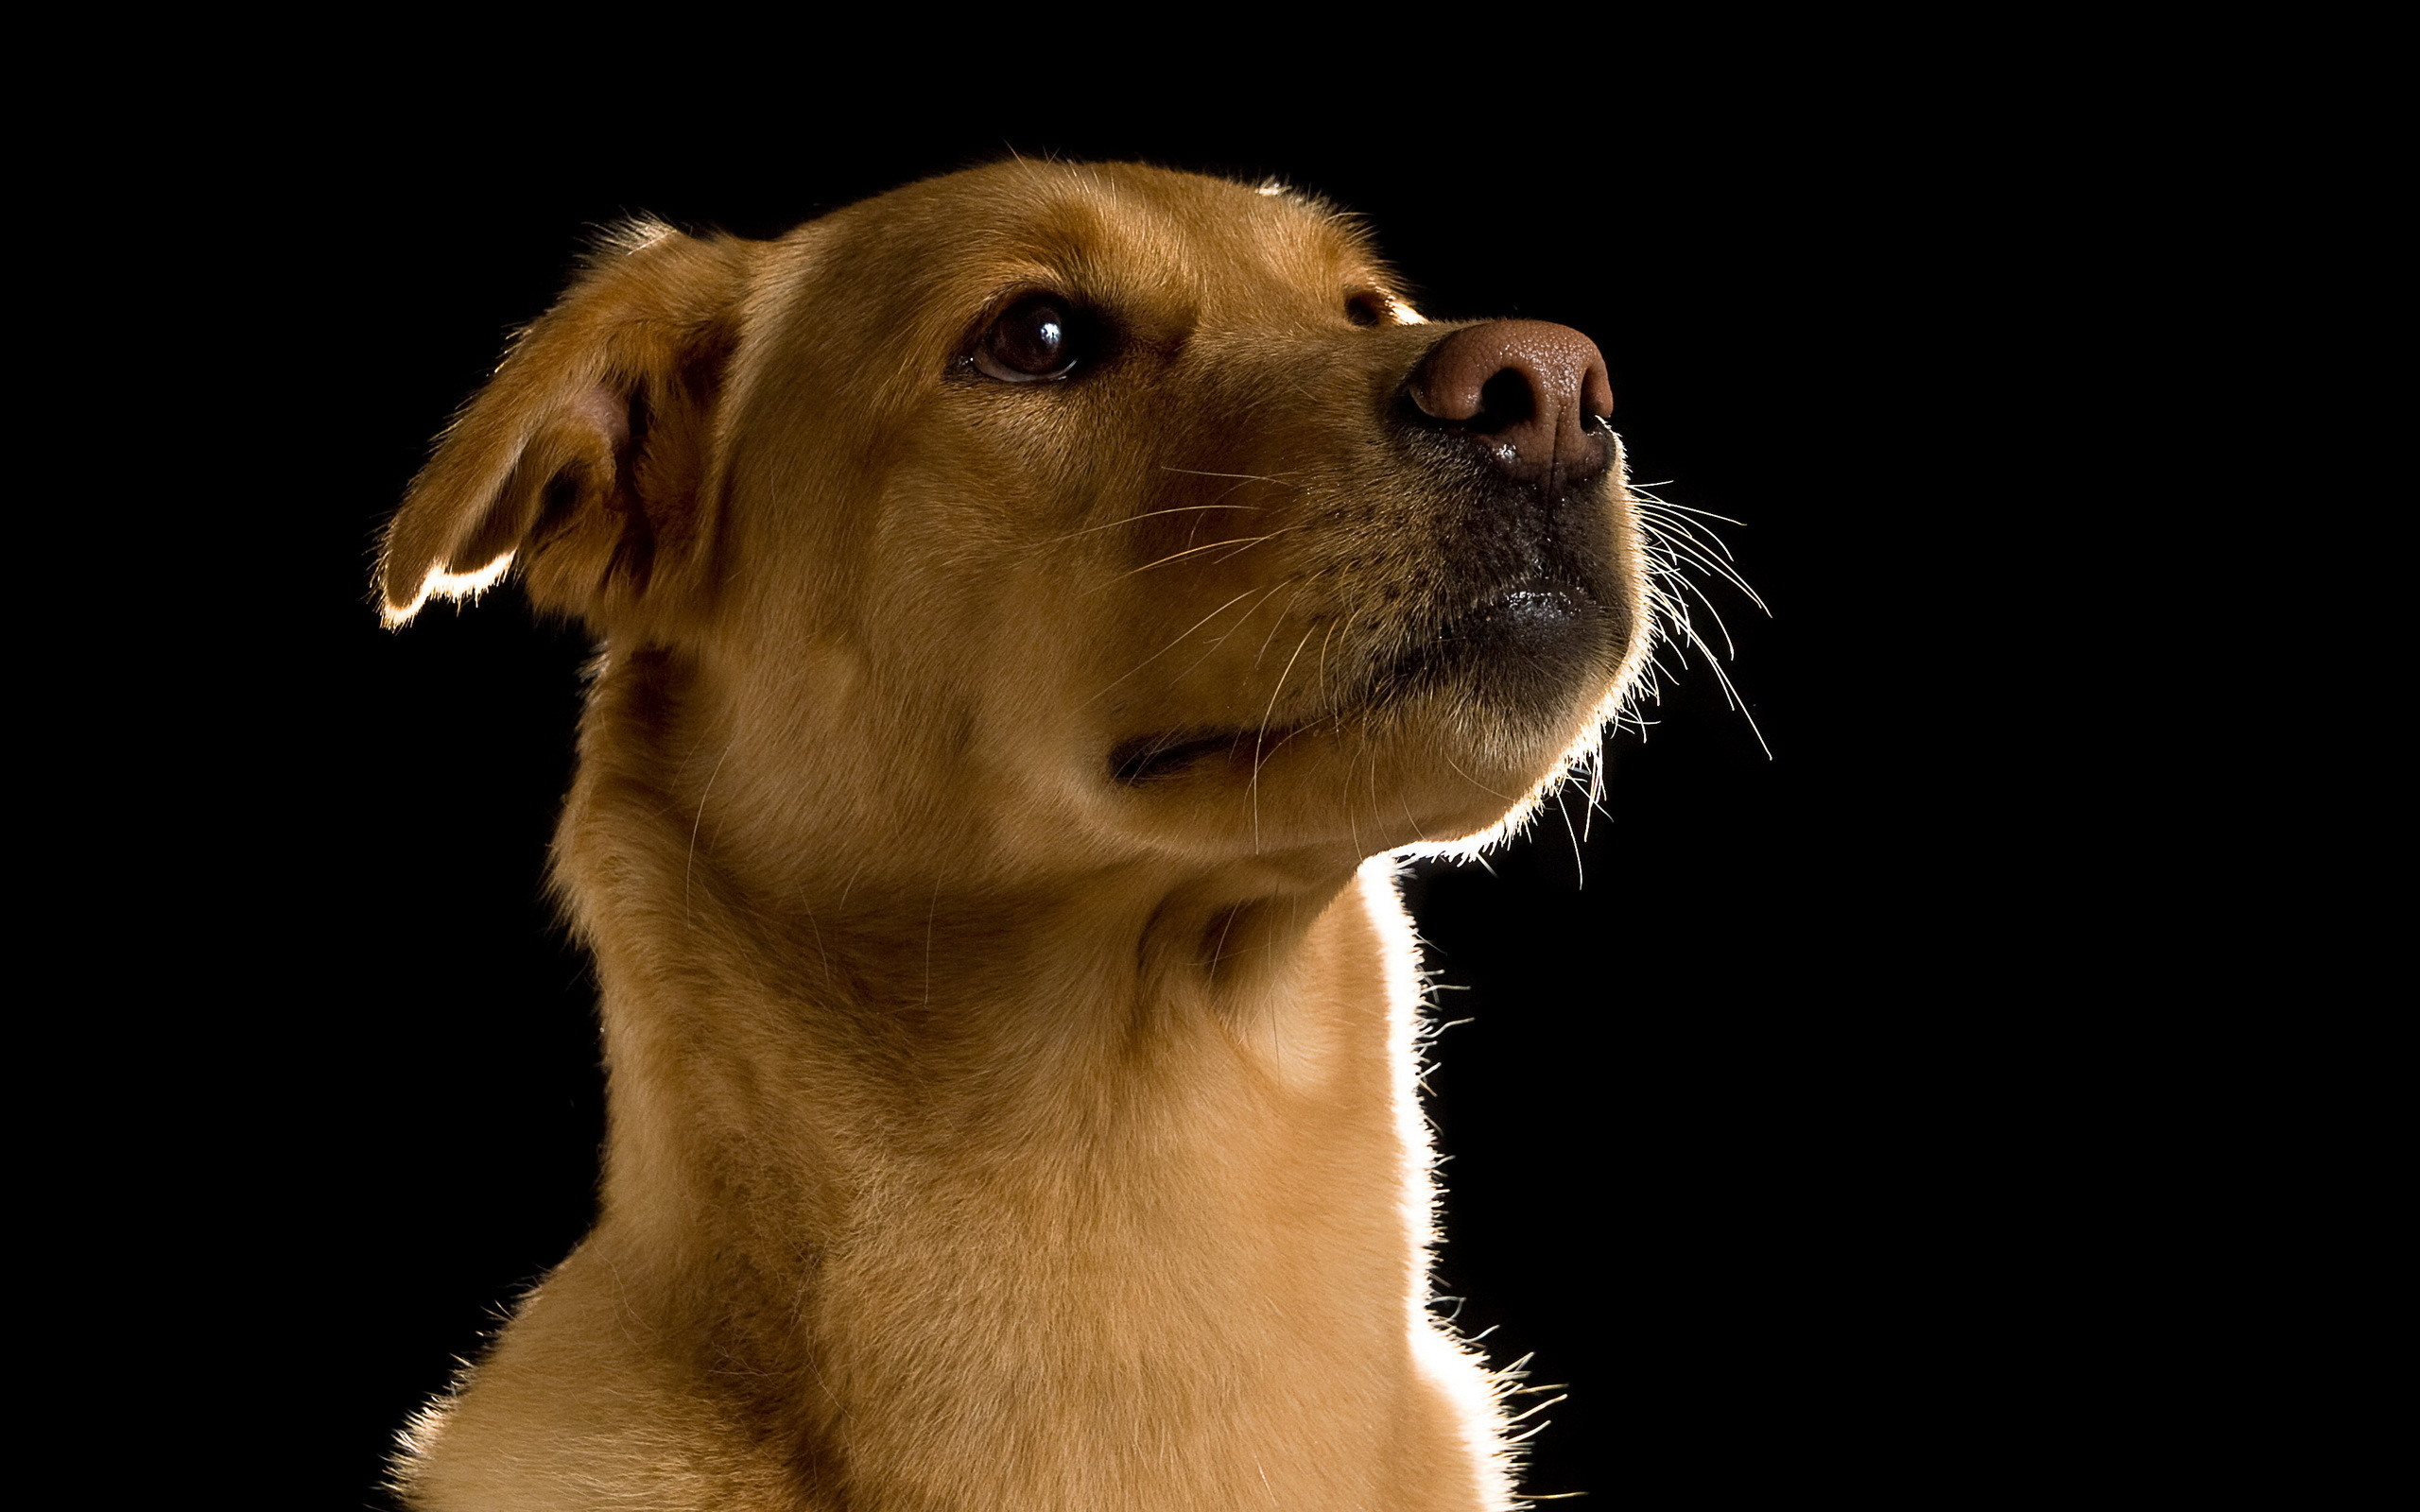 Fondos de pantalla 2560x1600 perro fondo negro animalia for Fondos de pantalla de perritos